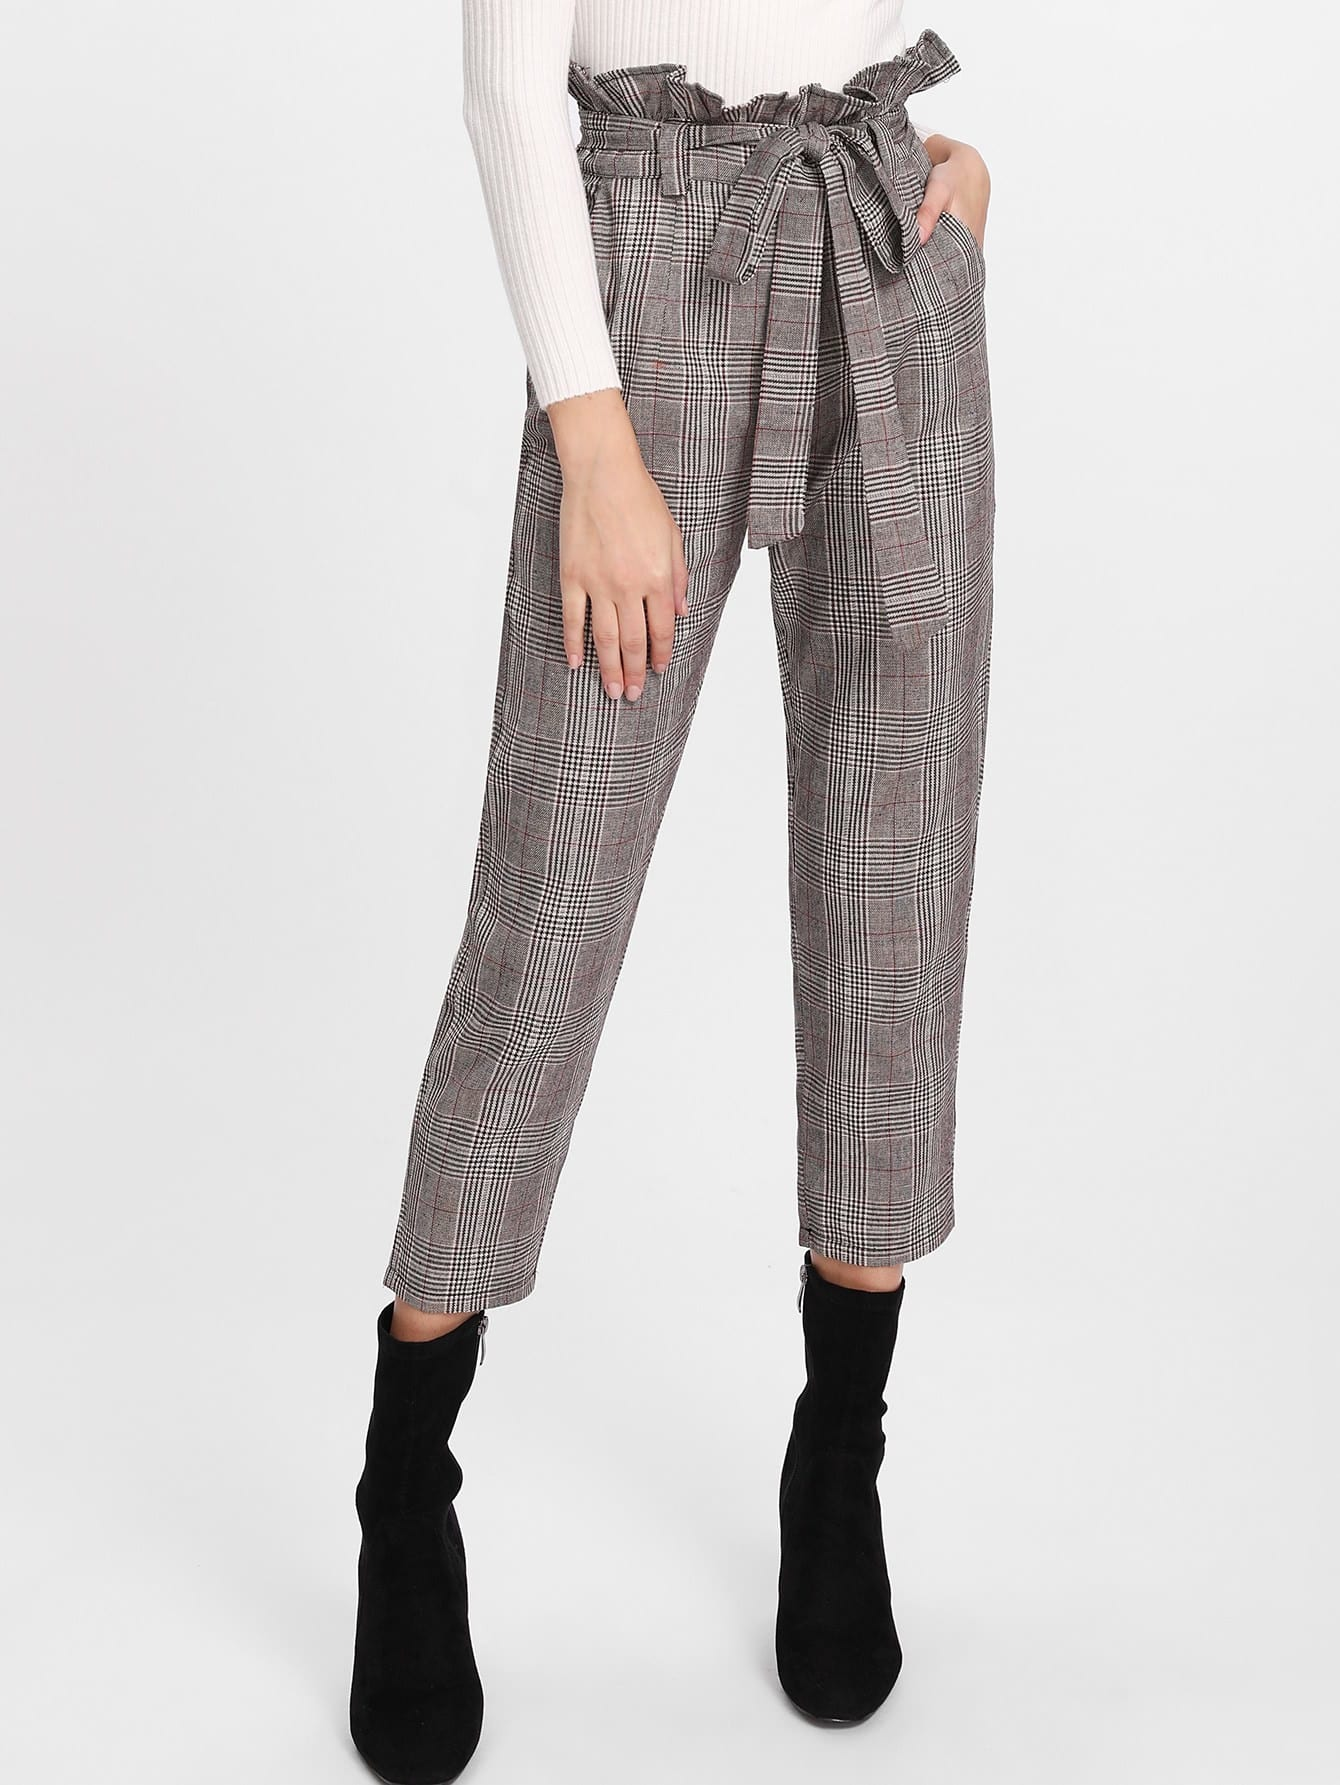 Glen Plaid Frill Waist Self Tie Capri Pants striped ruffled waist self tie pants